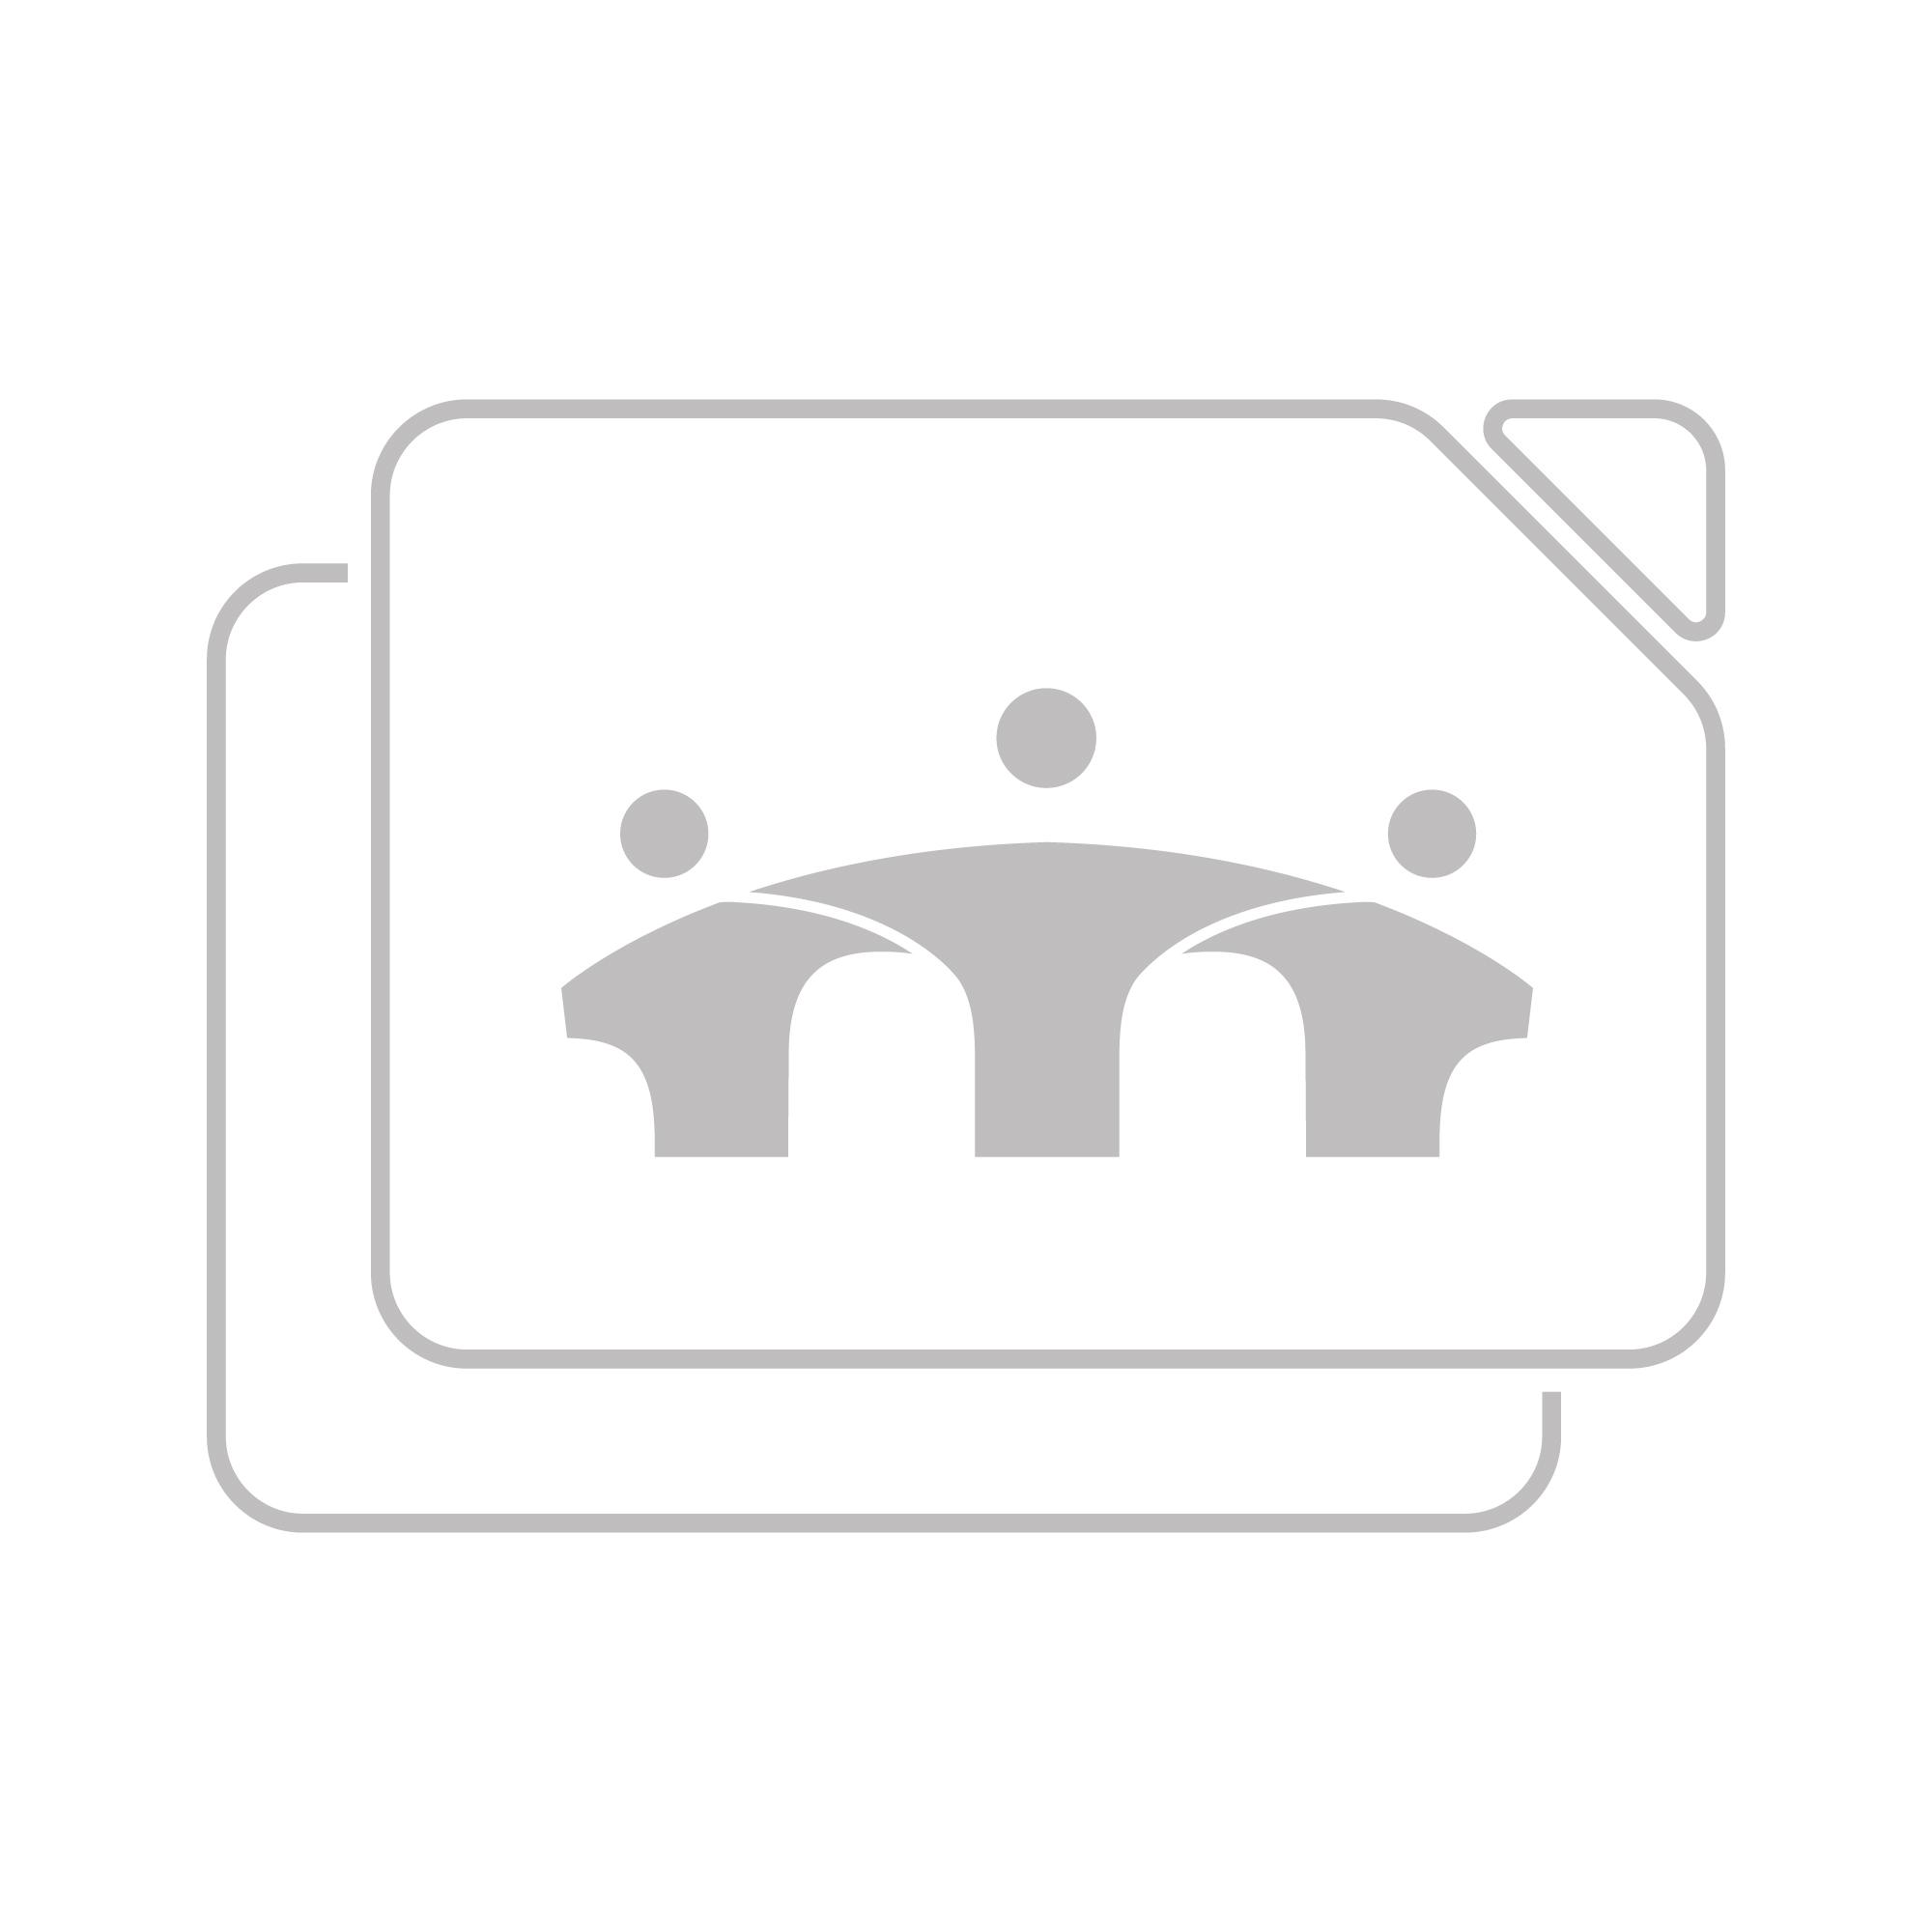 Seagate FireCuda 530 SSD with Heatsink 500GB